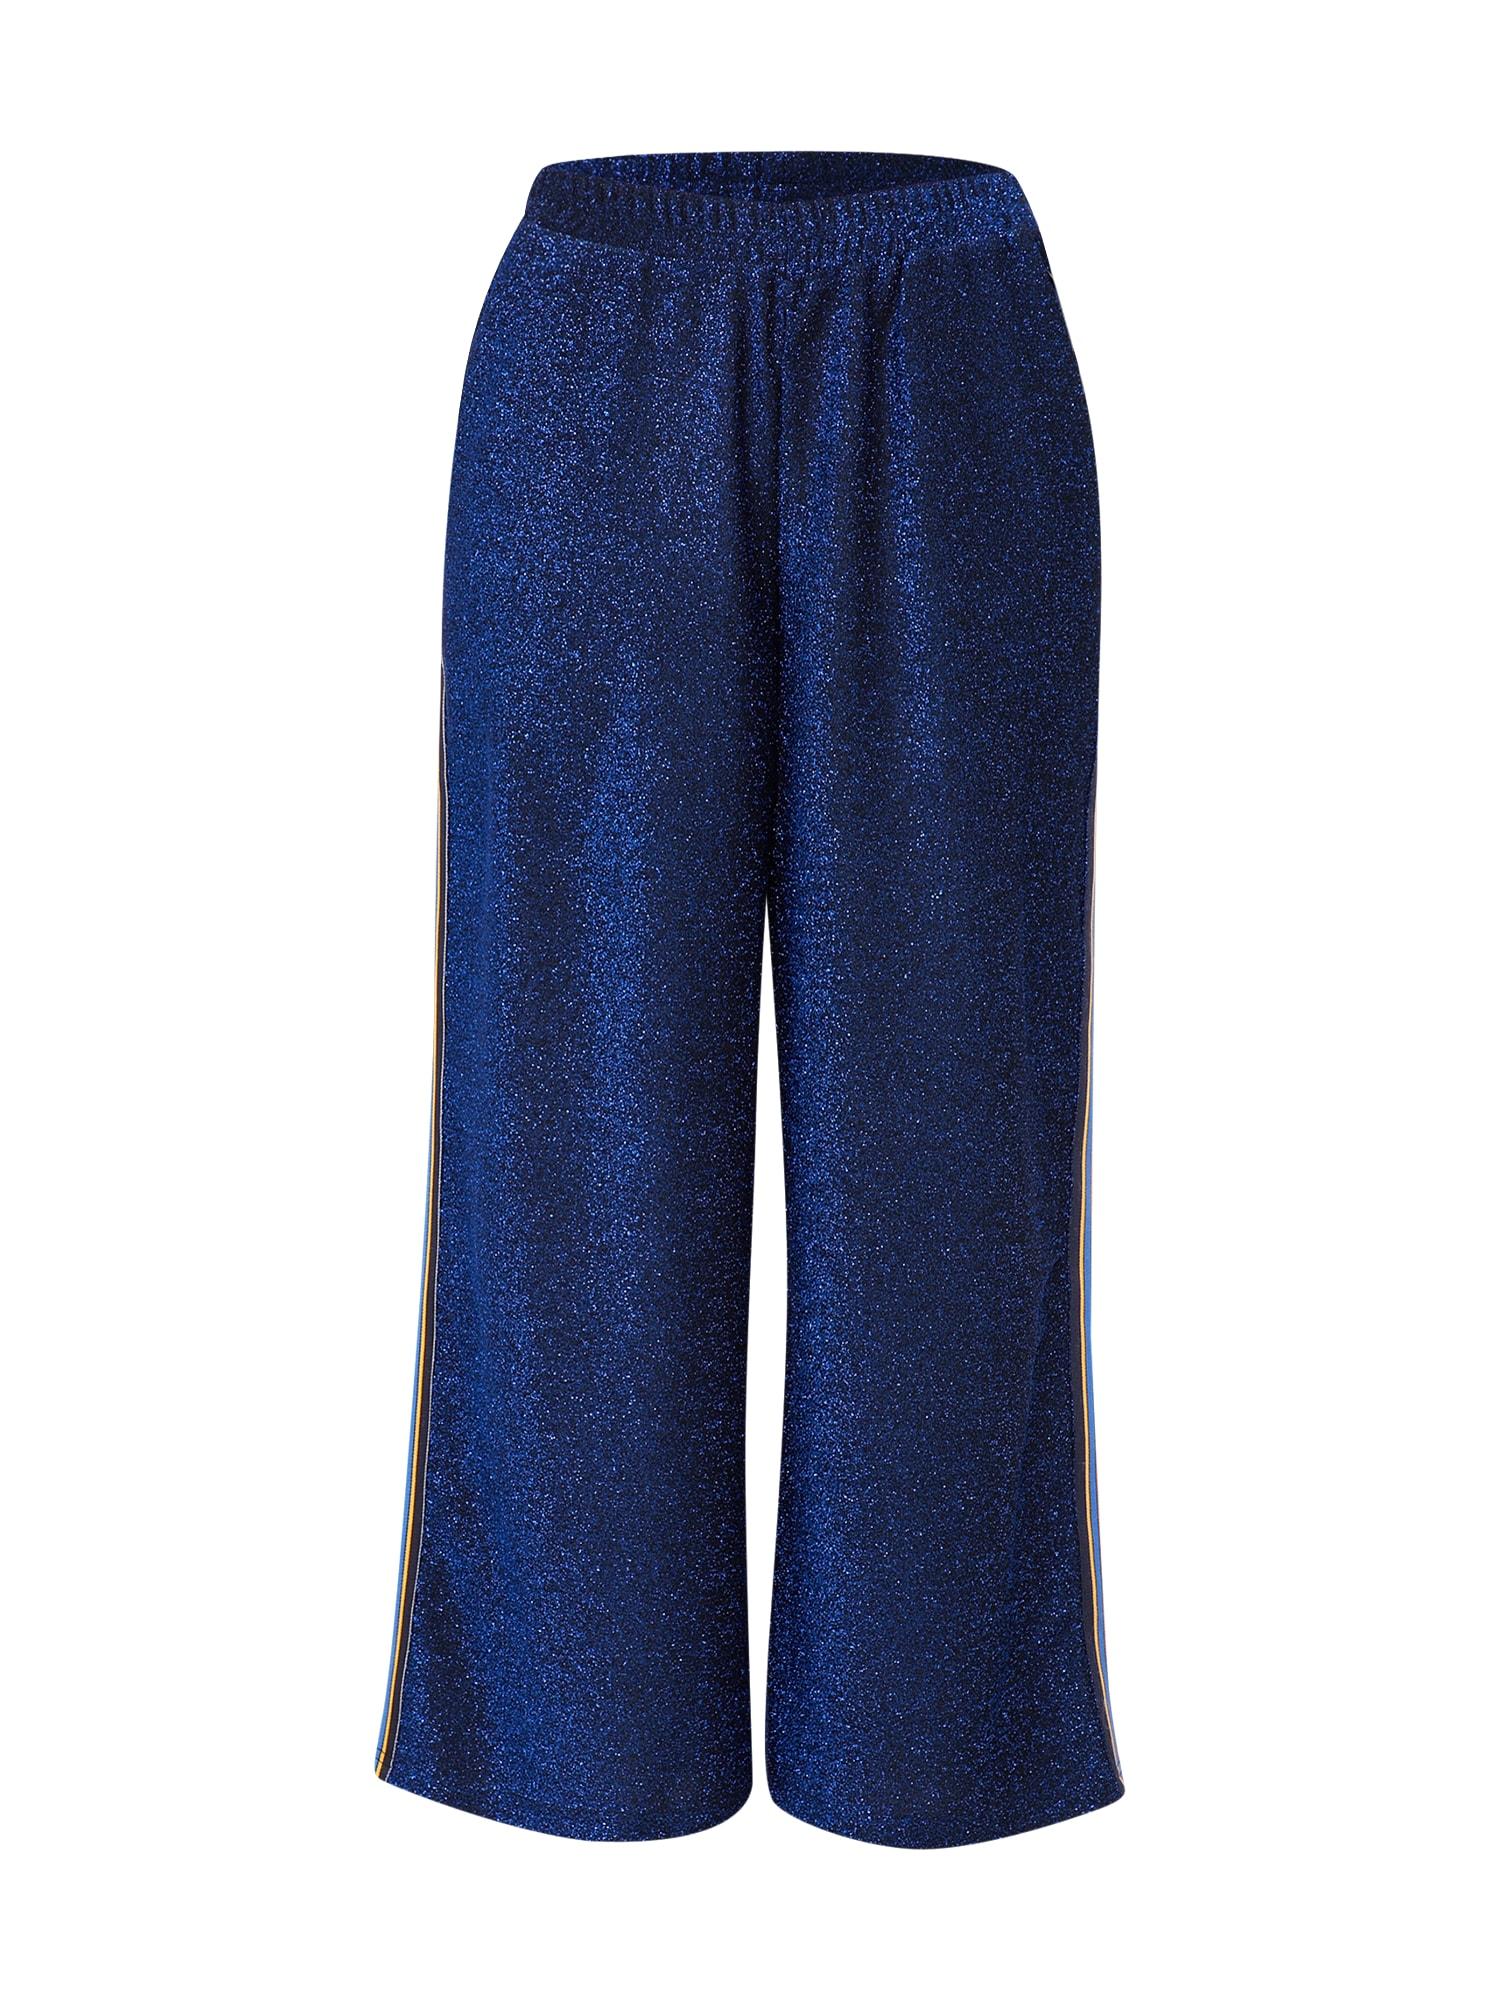 Kalhoty Devorah modrá NÜMPH